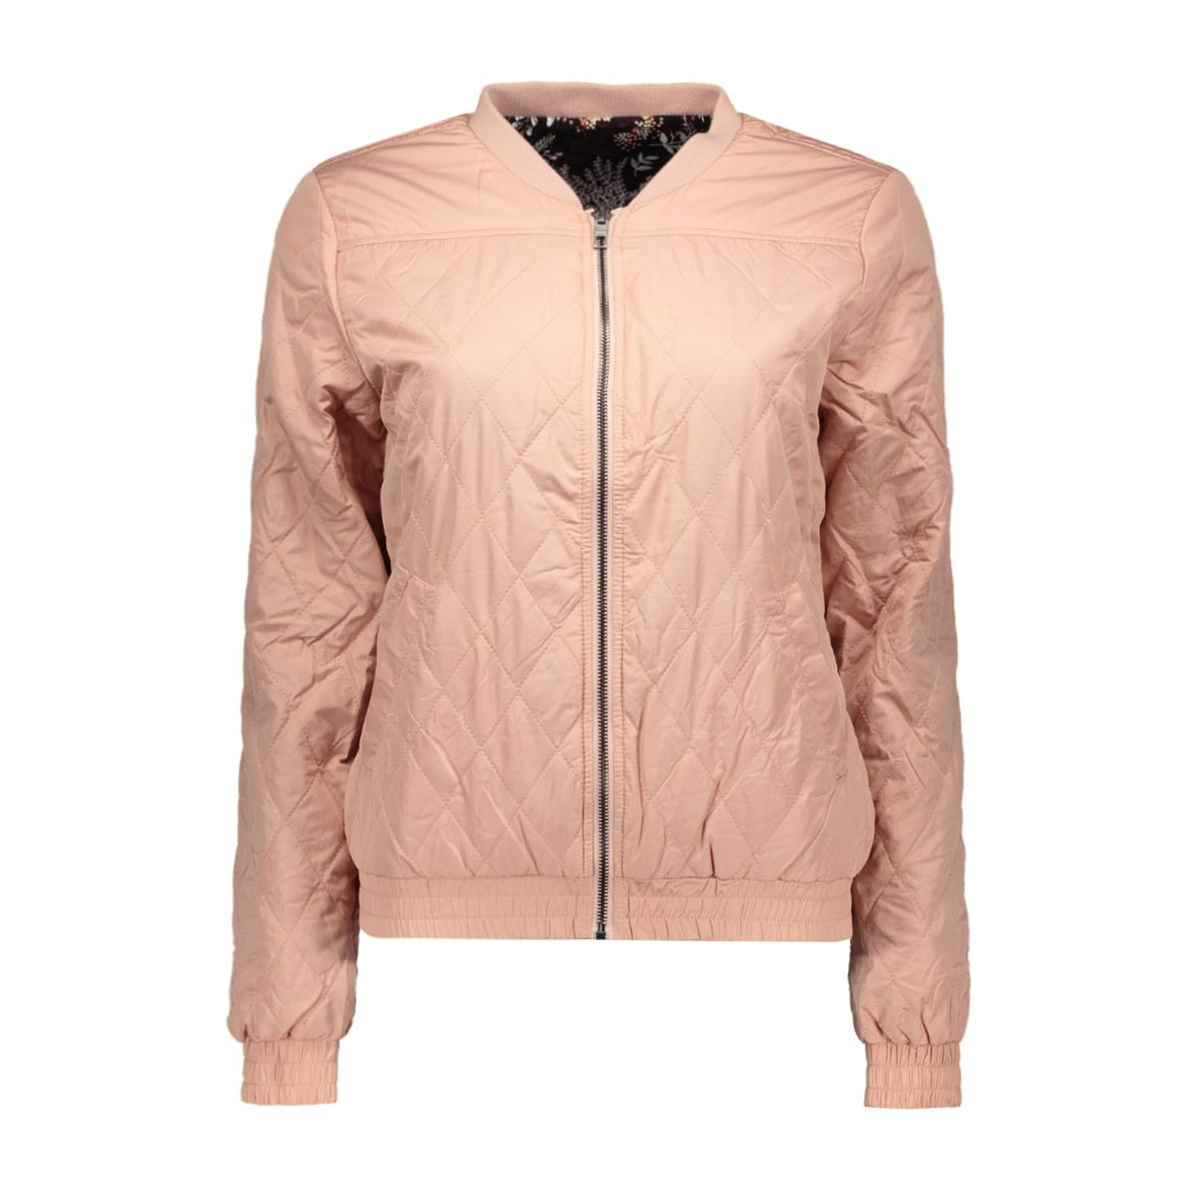 onlsmoke nova bomber jacket otw 15129208 only jas misty rose/ flower